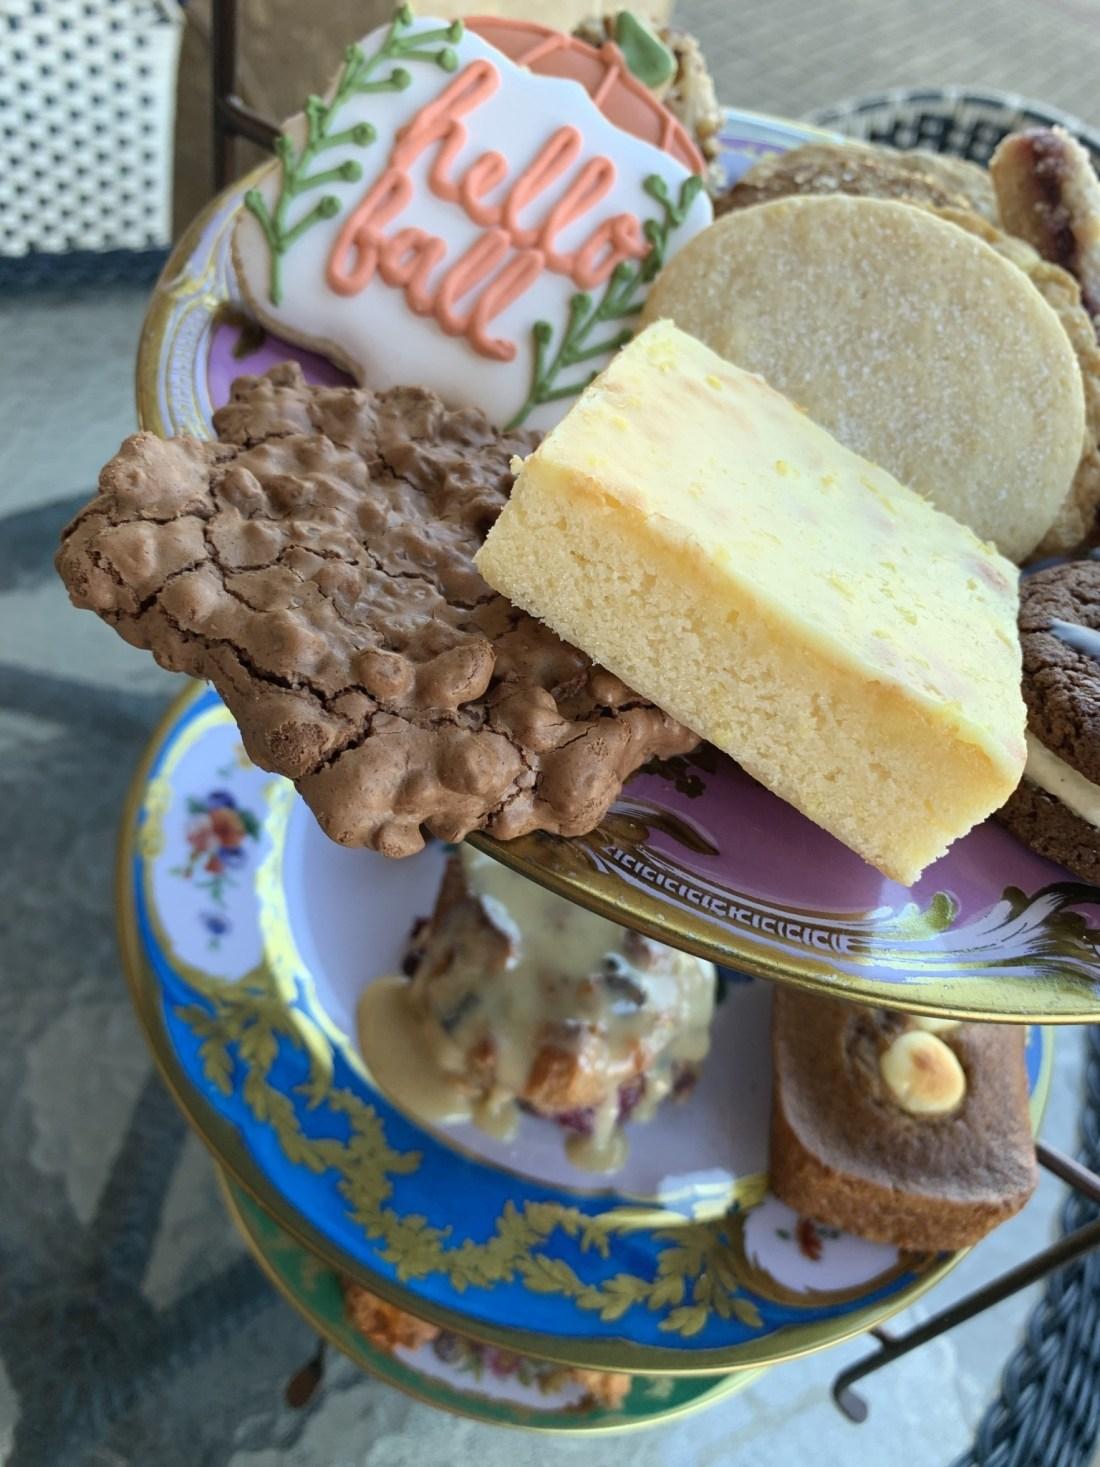 Plate of cookies and brownies